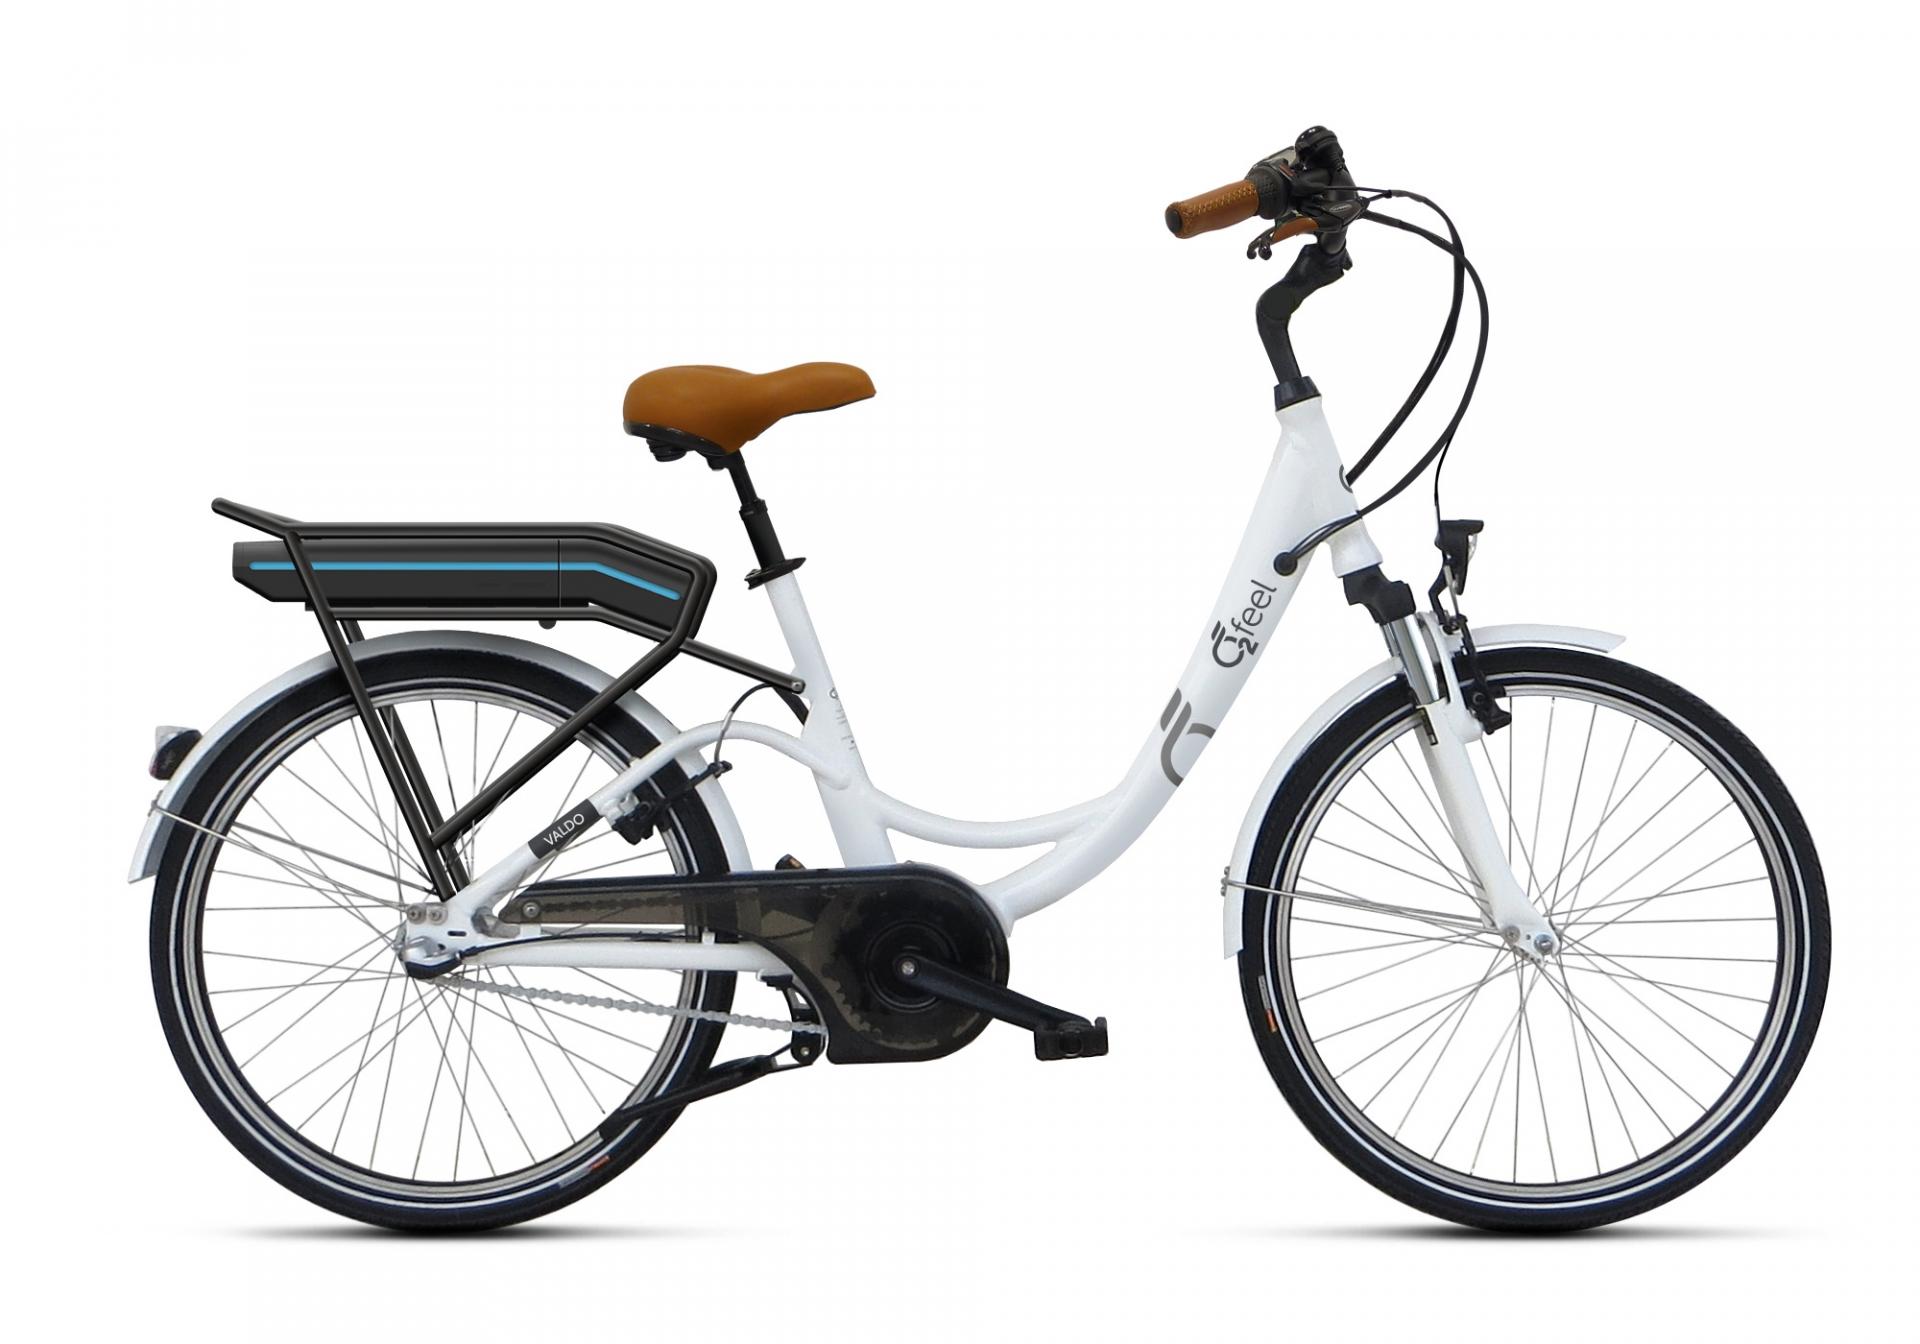 Vélo électrique O2Feel Valdo N3 374 Wh Blanc